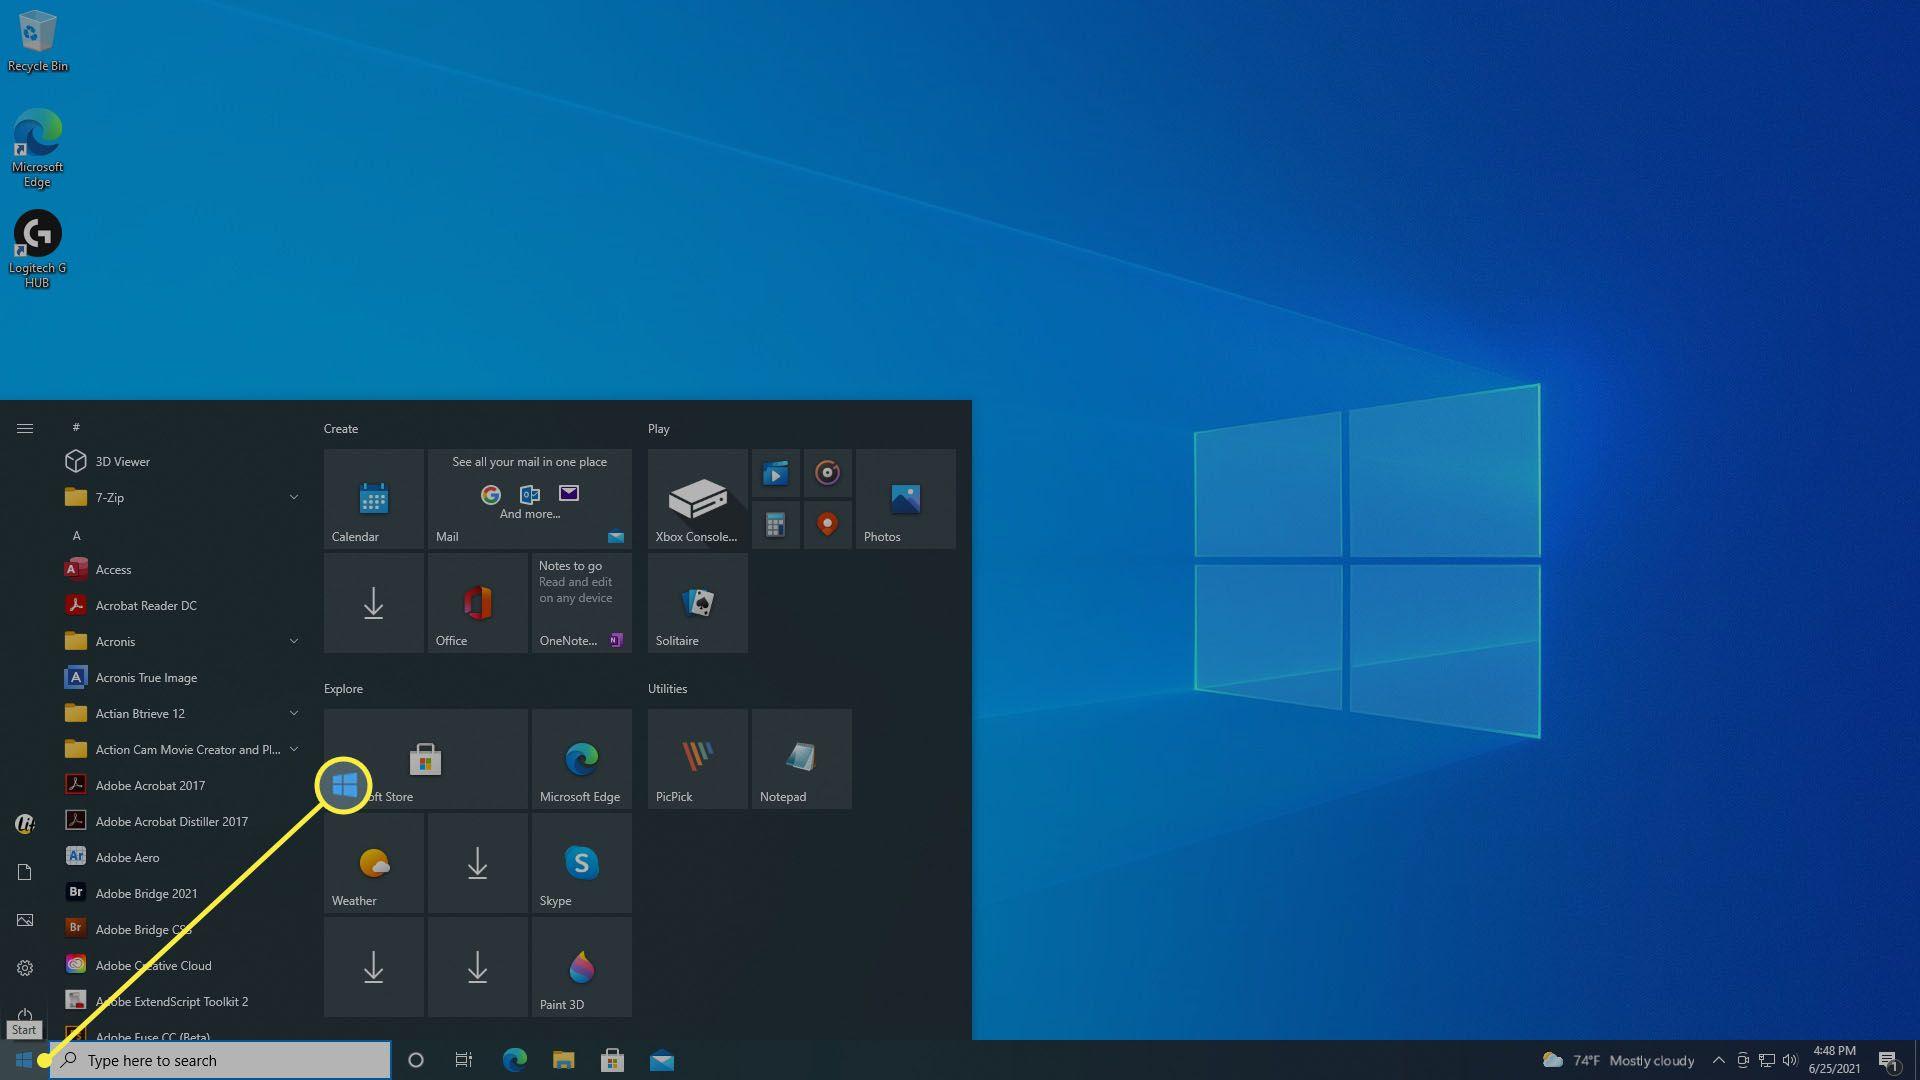 The Windows 10 Start Menu.